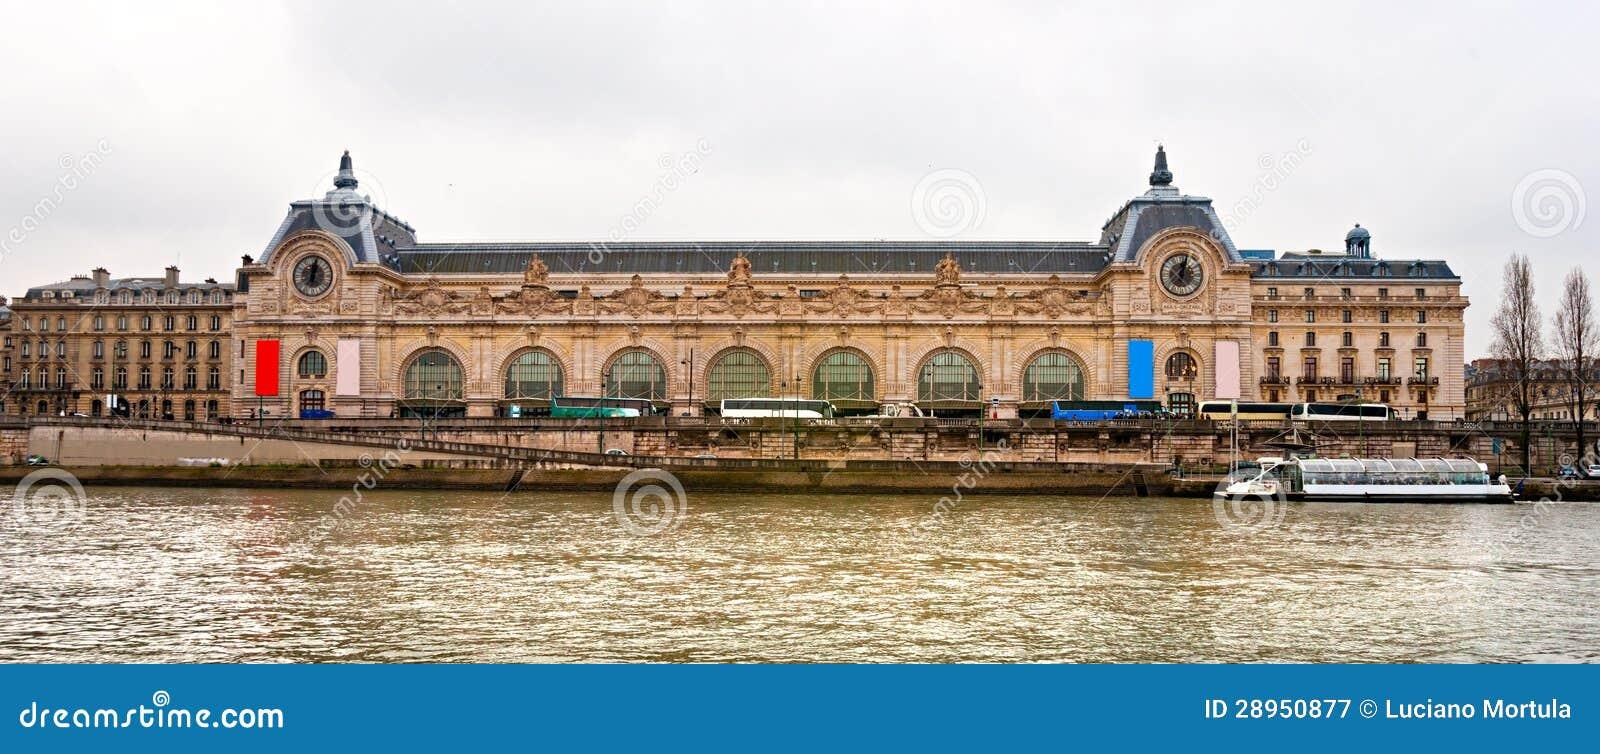 Orsay muzeum, Paryż.